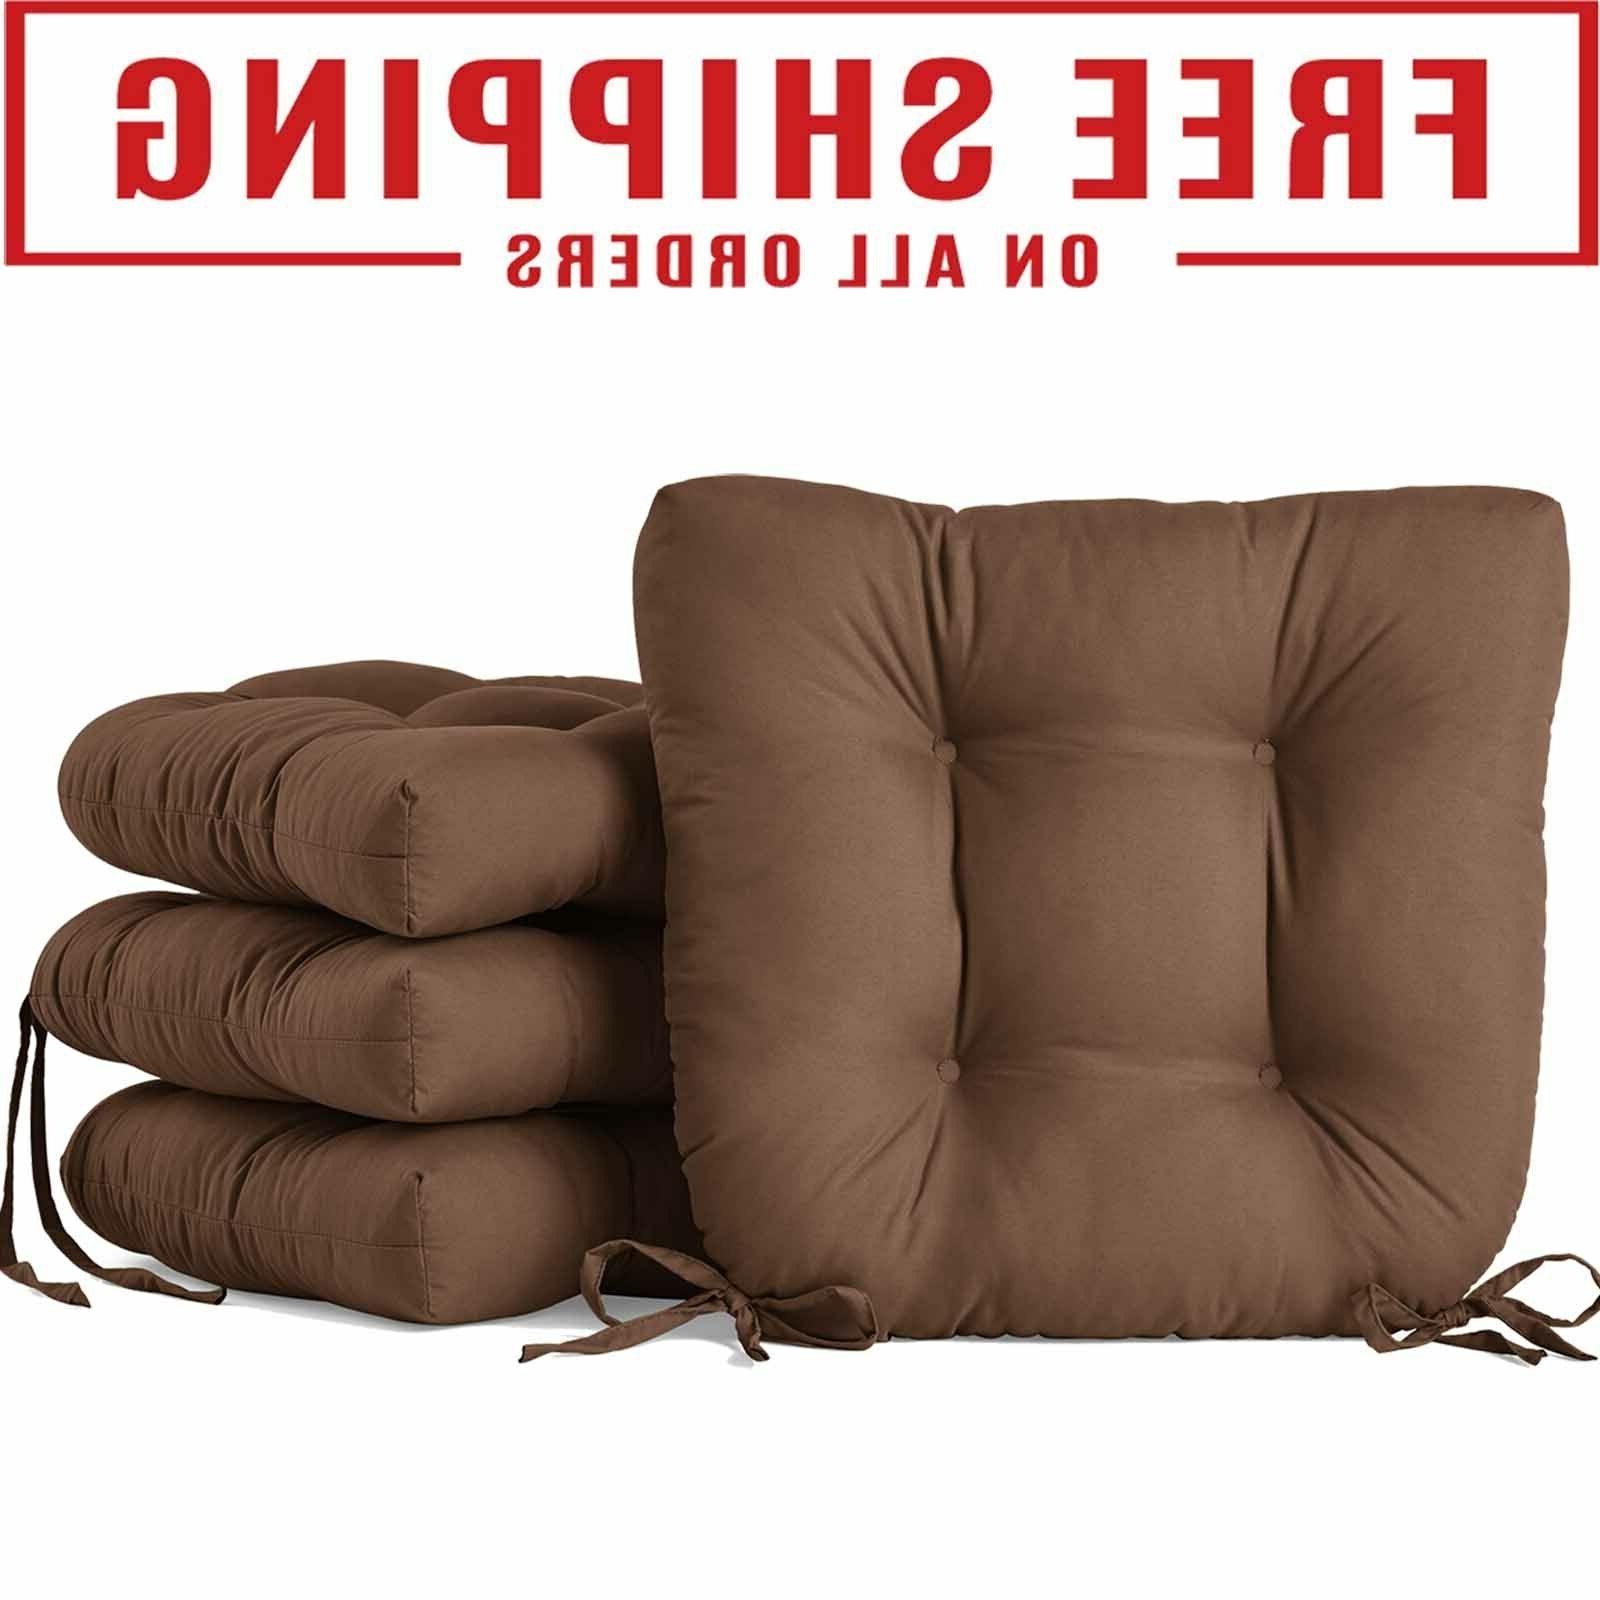 square seat tuft cushion pads w ties